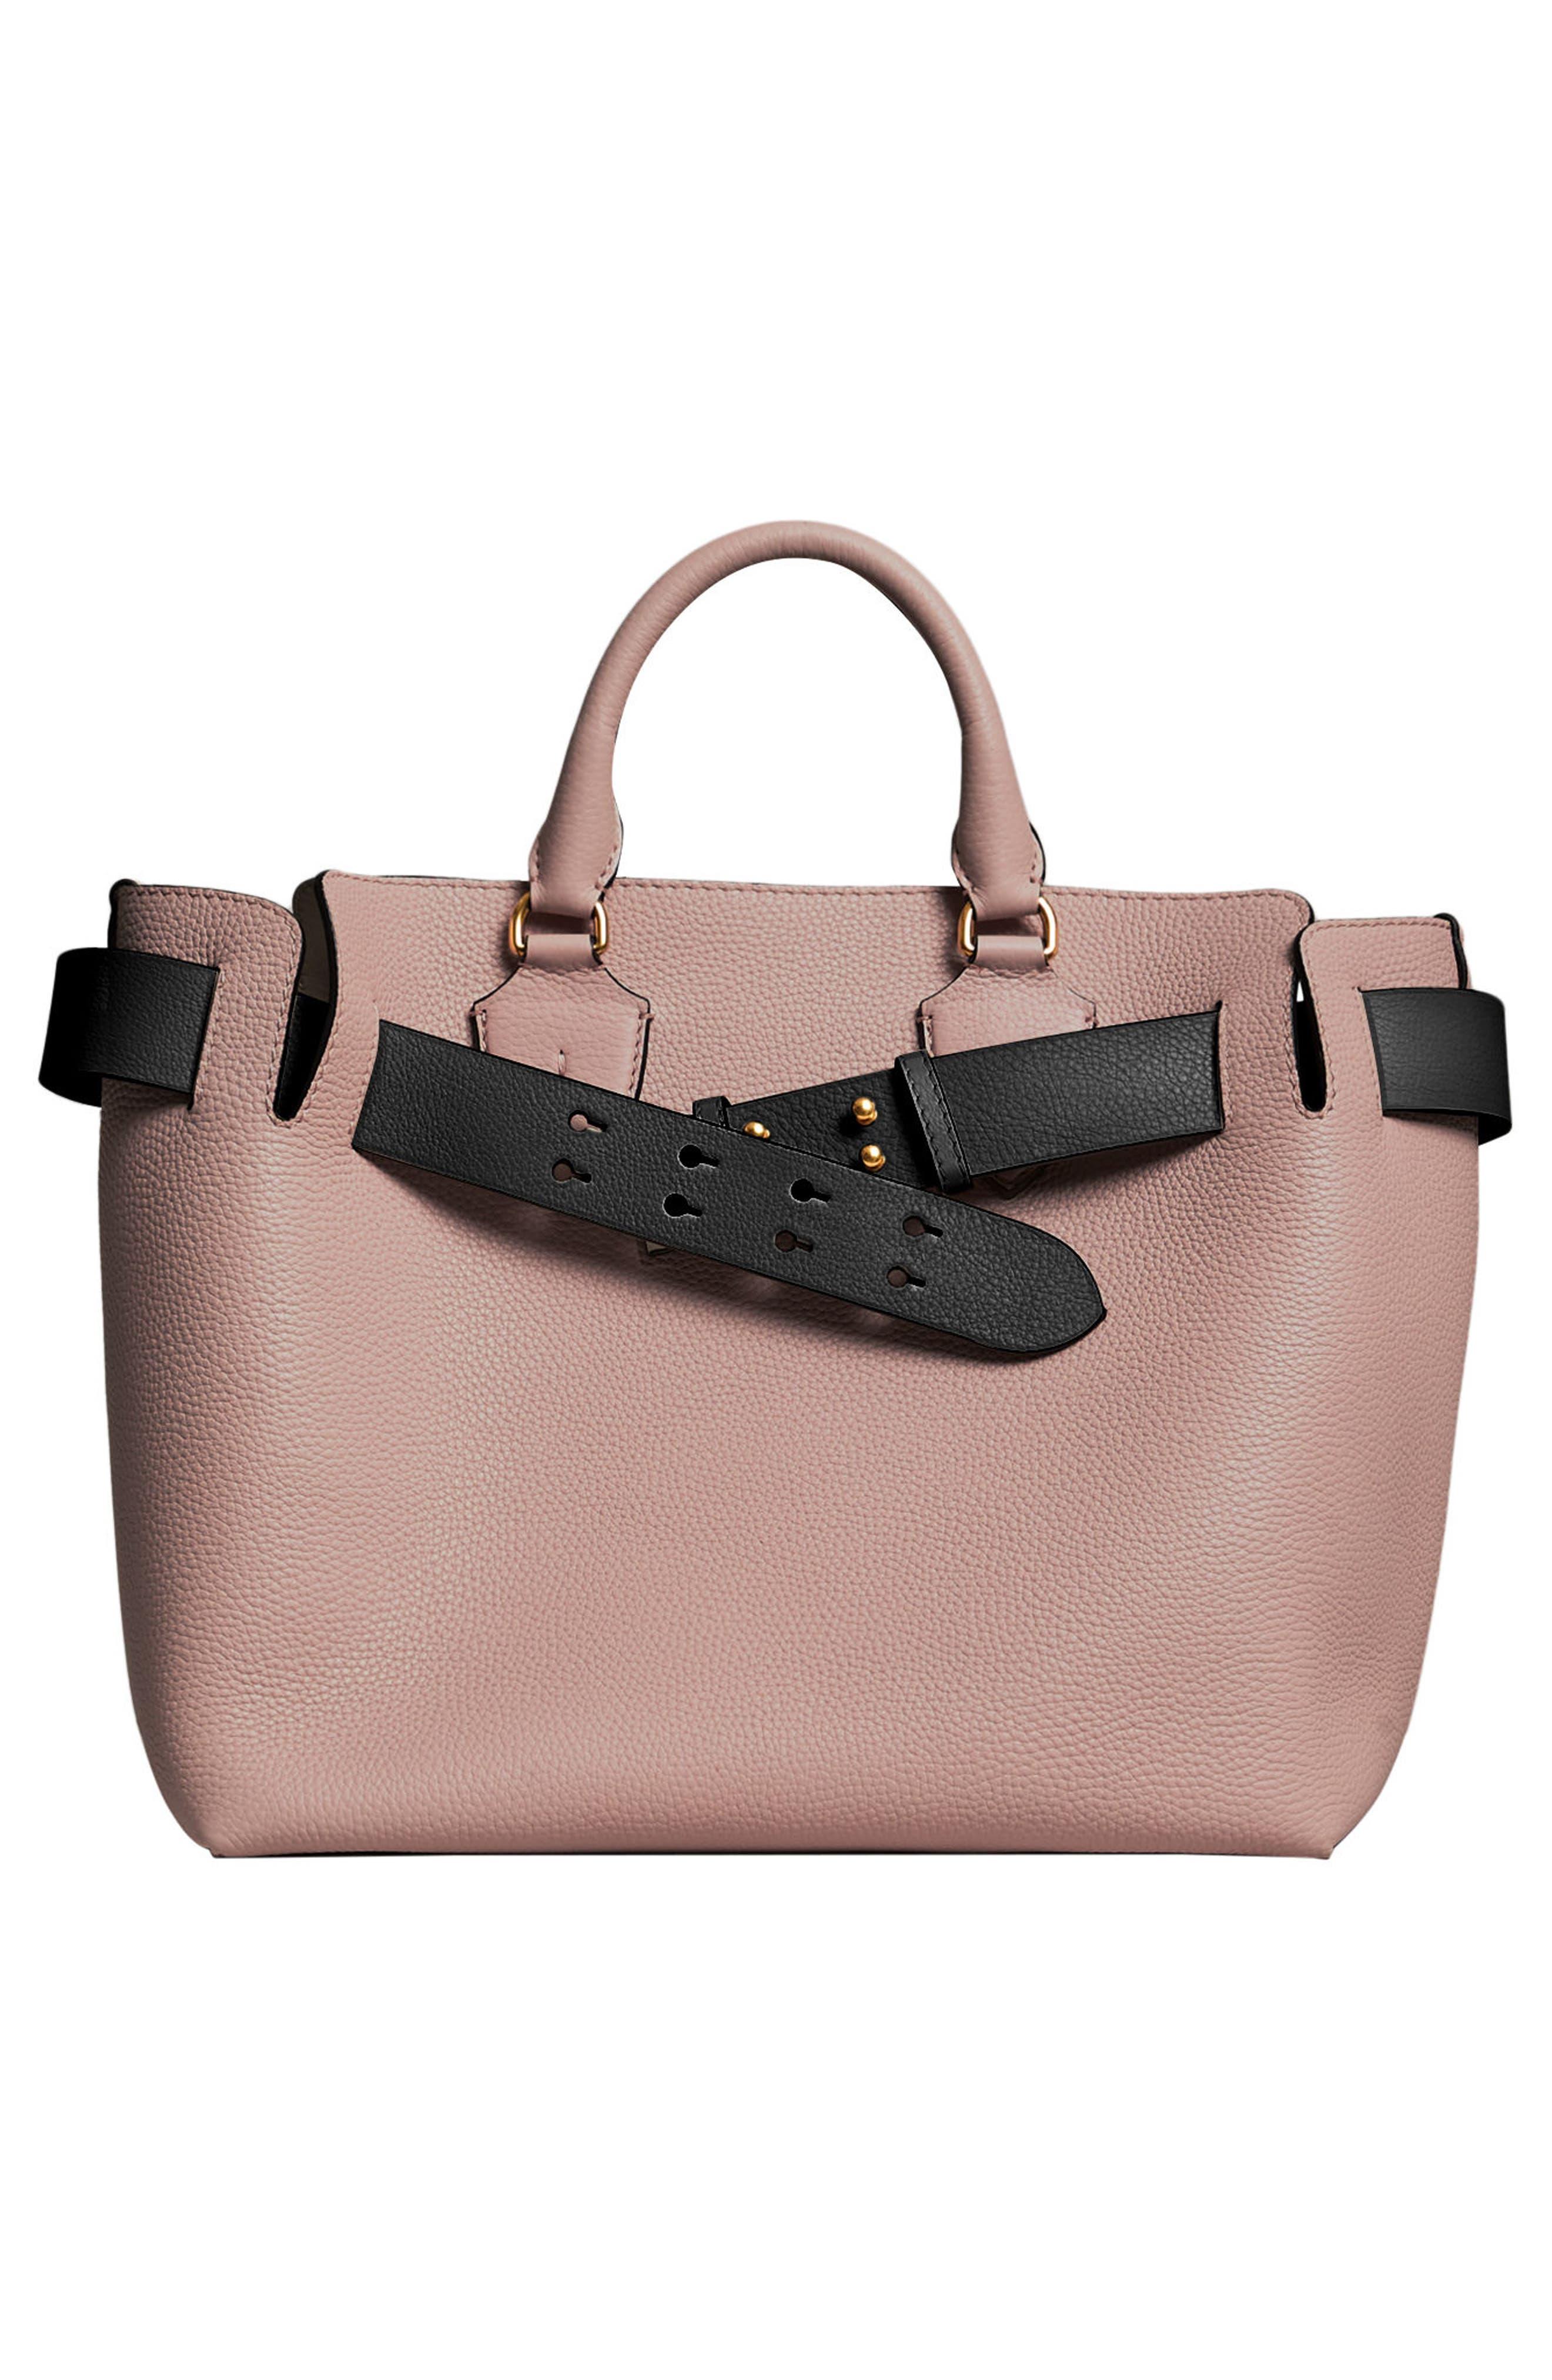 Medium Belt Bag Leather Tote,                             Alternate thumbnail 3, color,                             PALE ASH ROSE